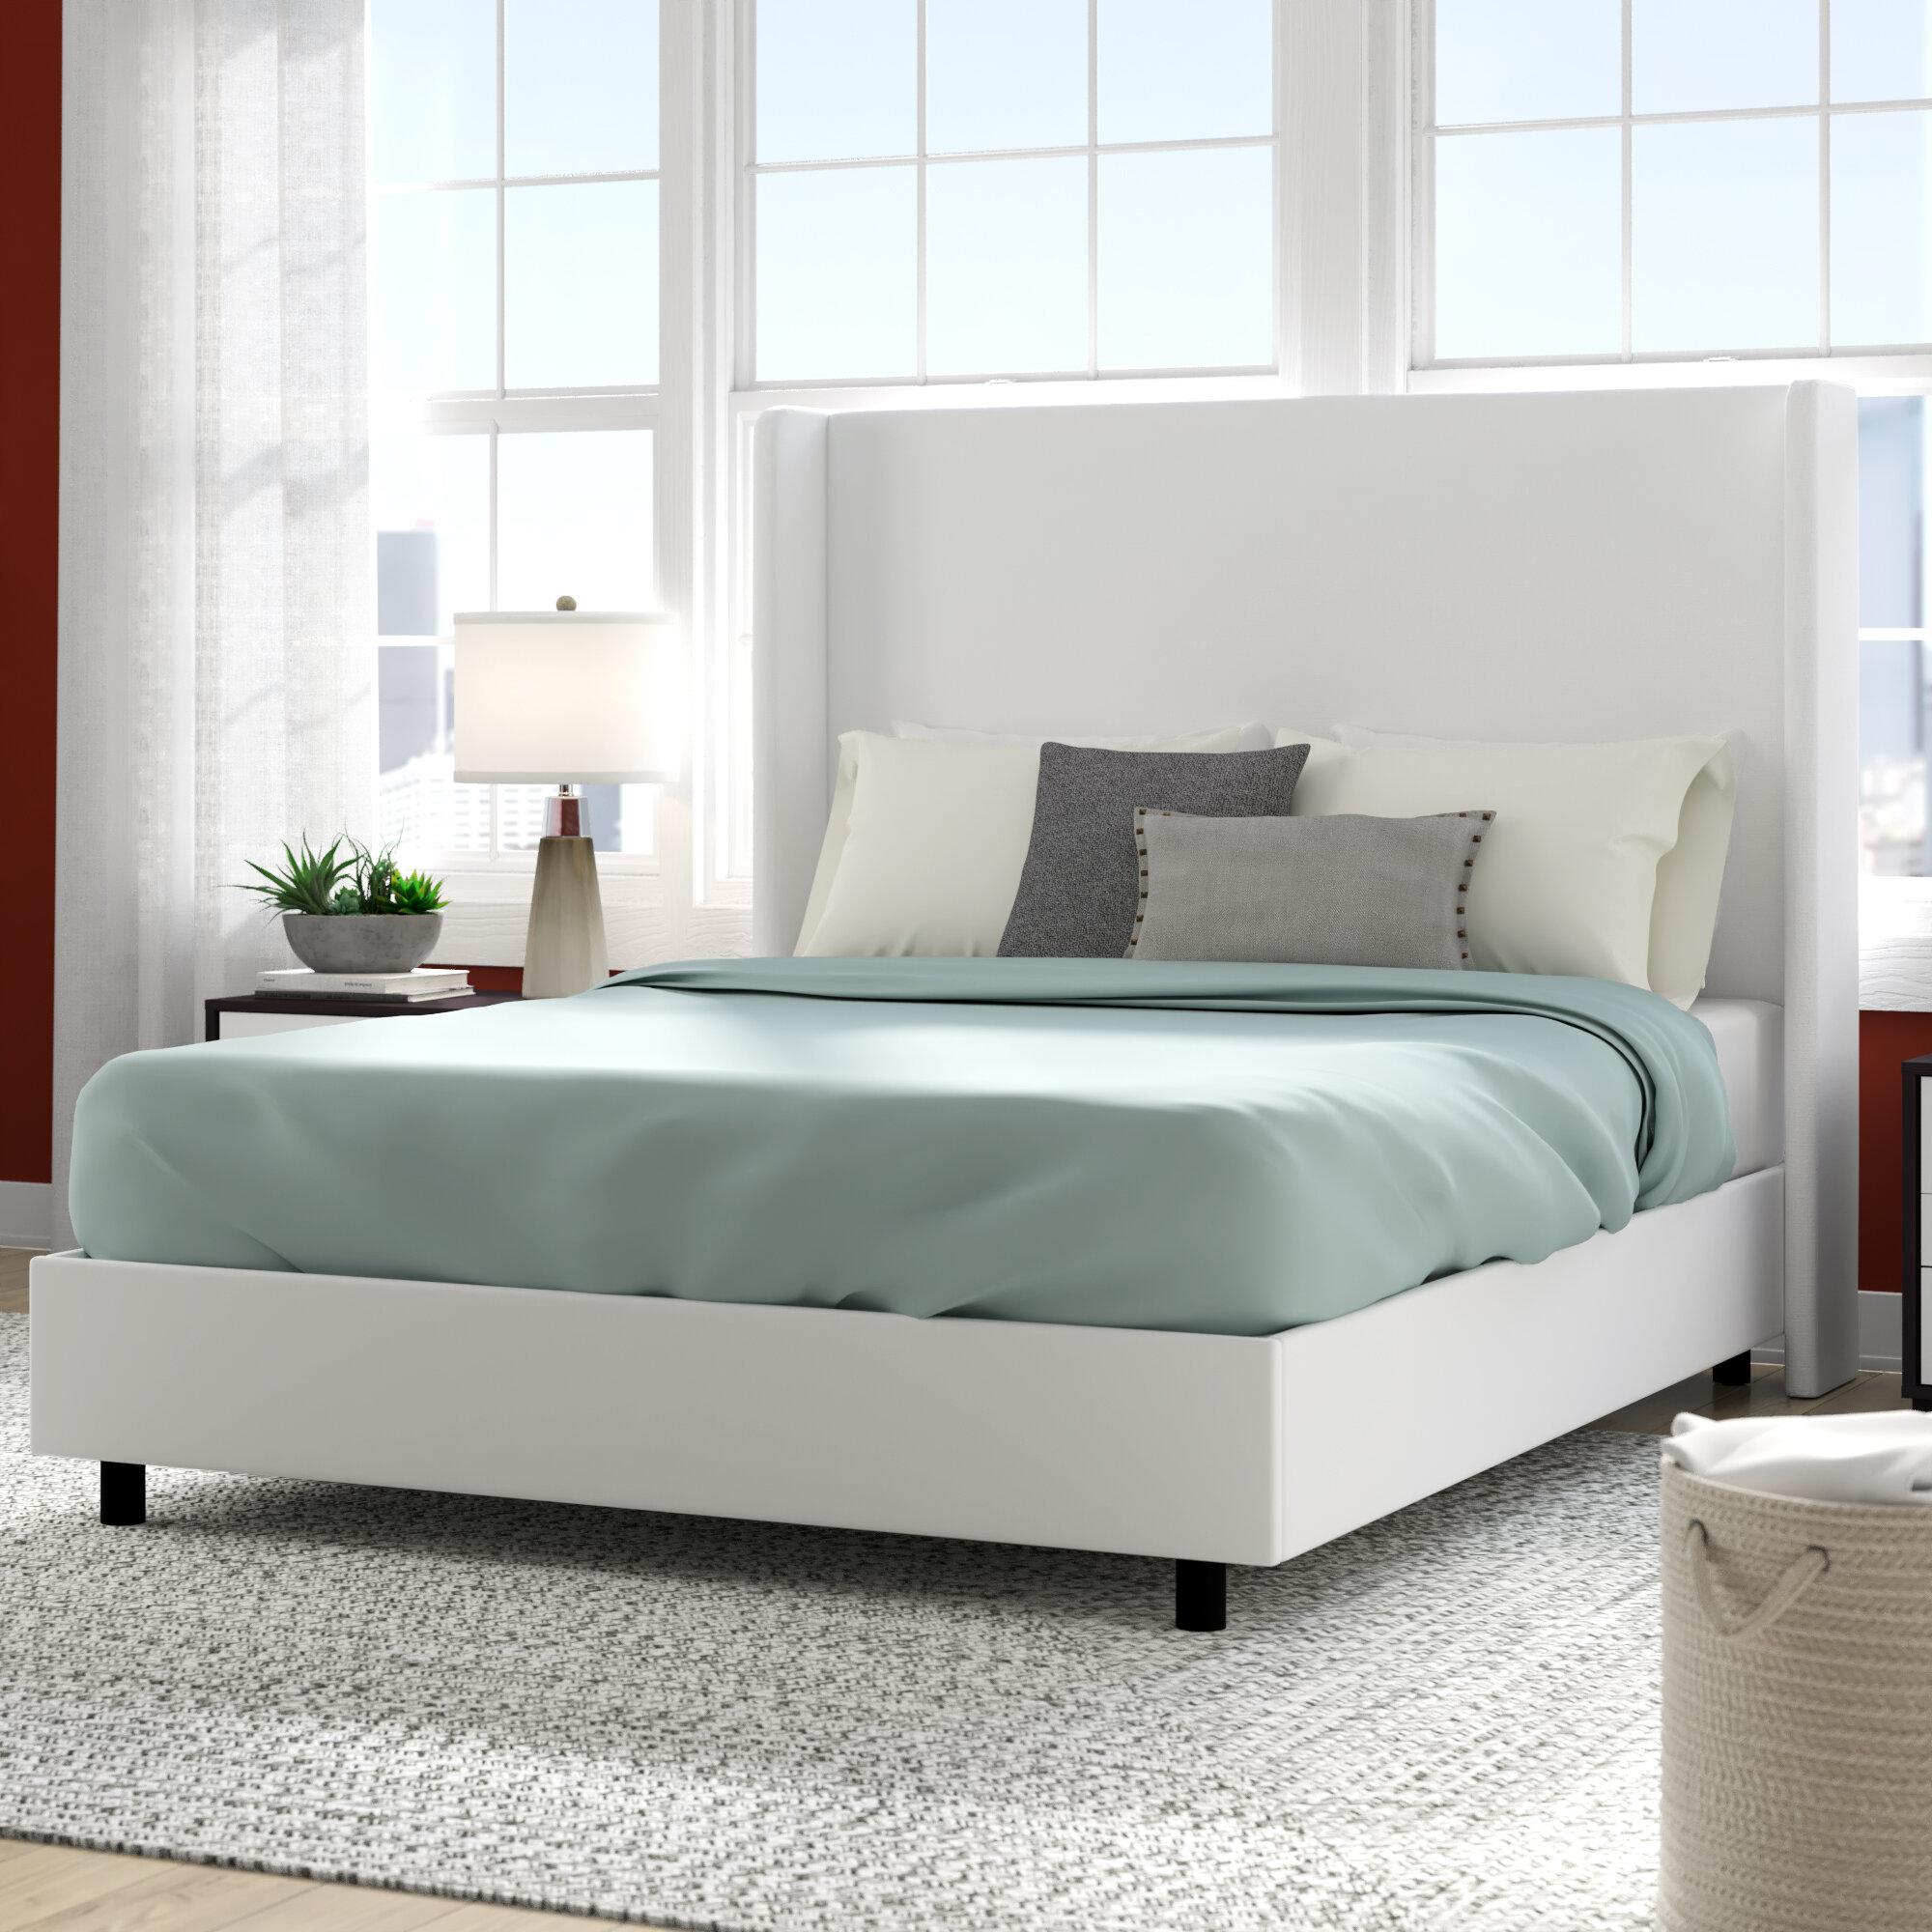 Brayden Studio Goodrich Velvet Upholstered Standard Bed Reviews Wayfair